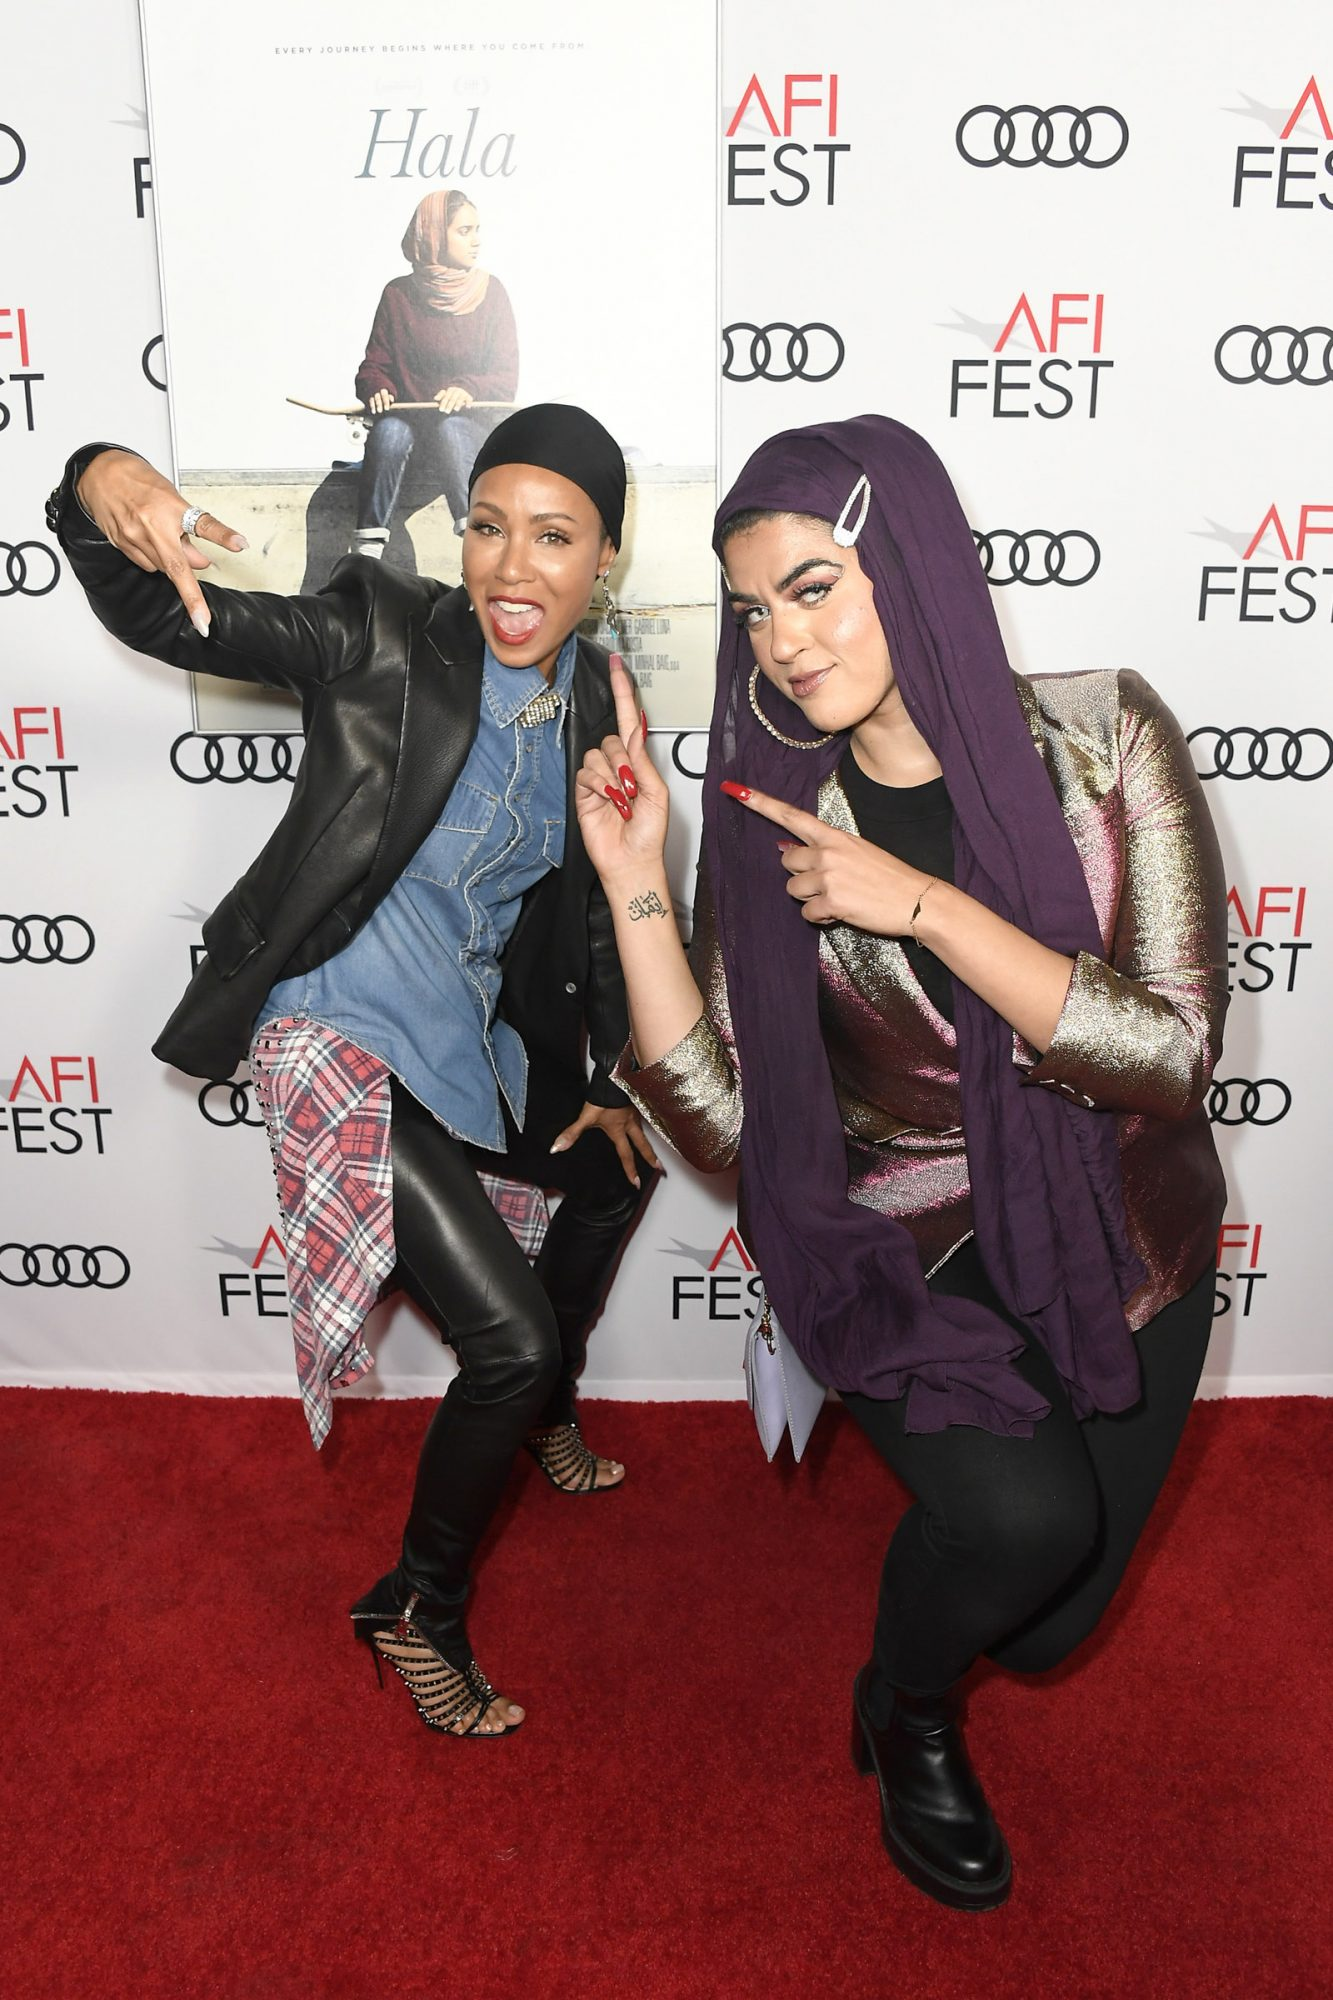 Jada Pinkett Smith and Amani al-Khatahtbeh